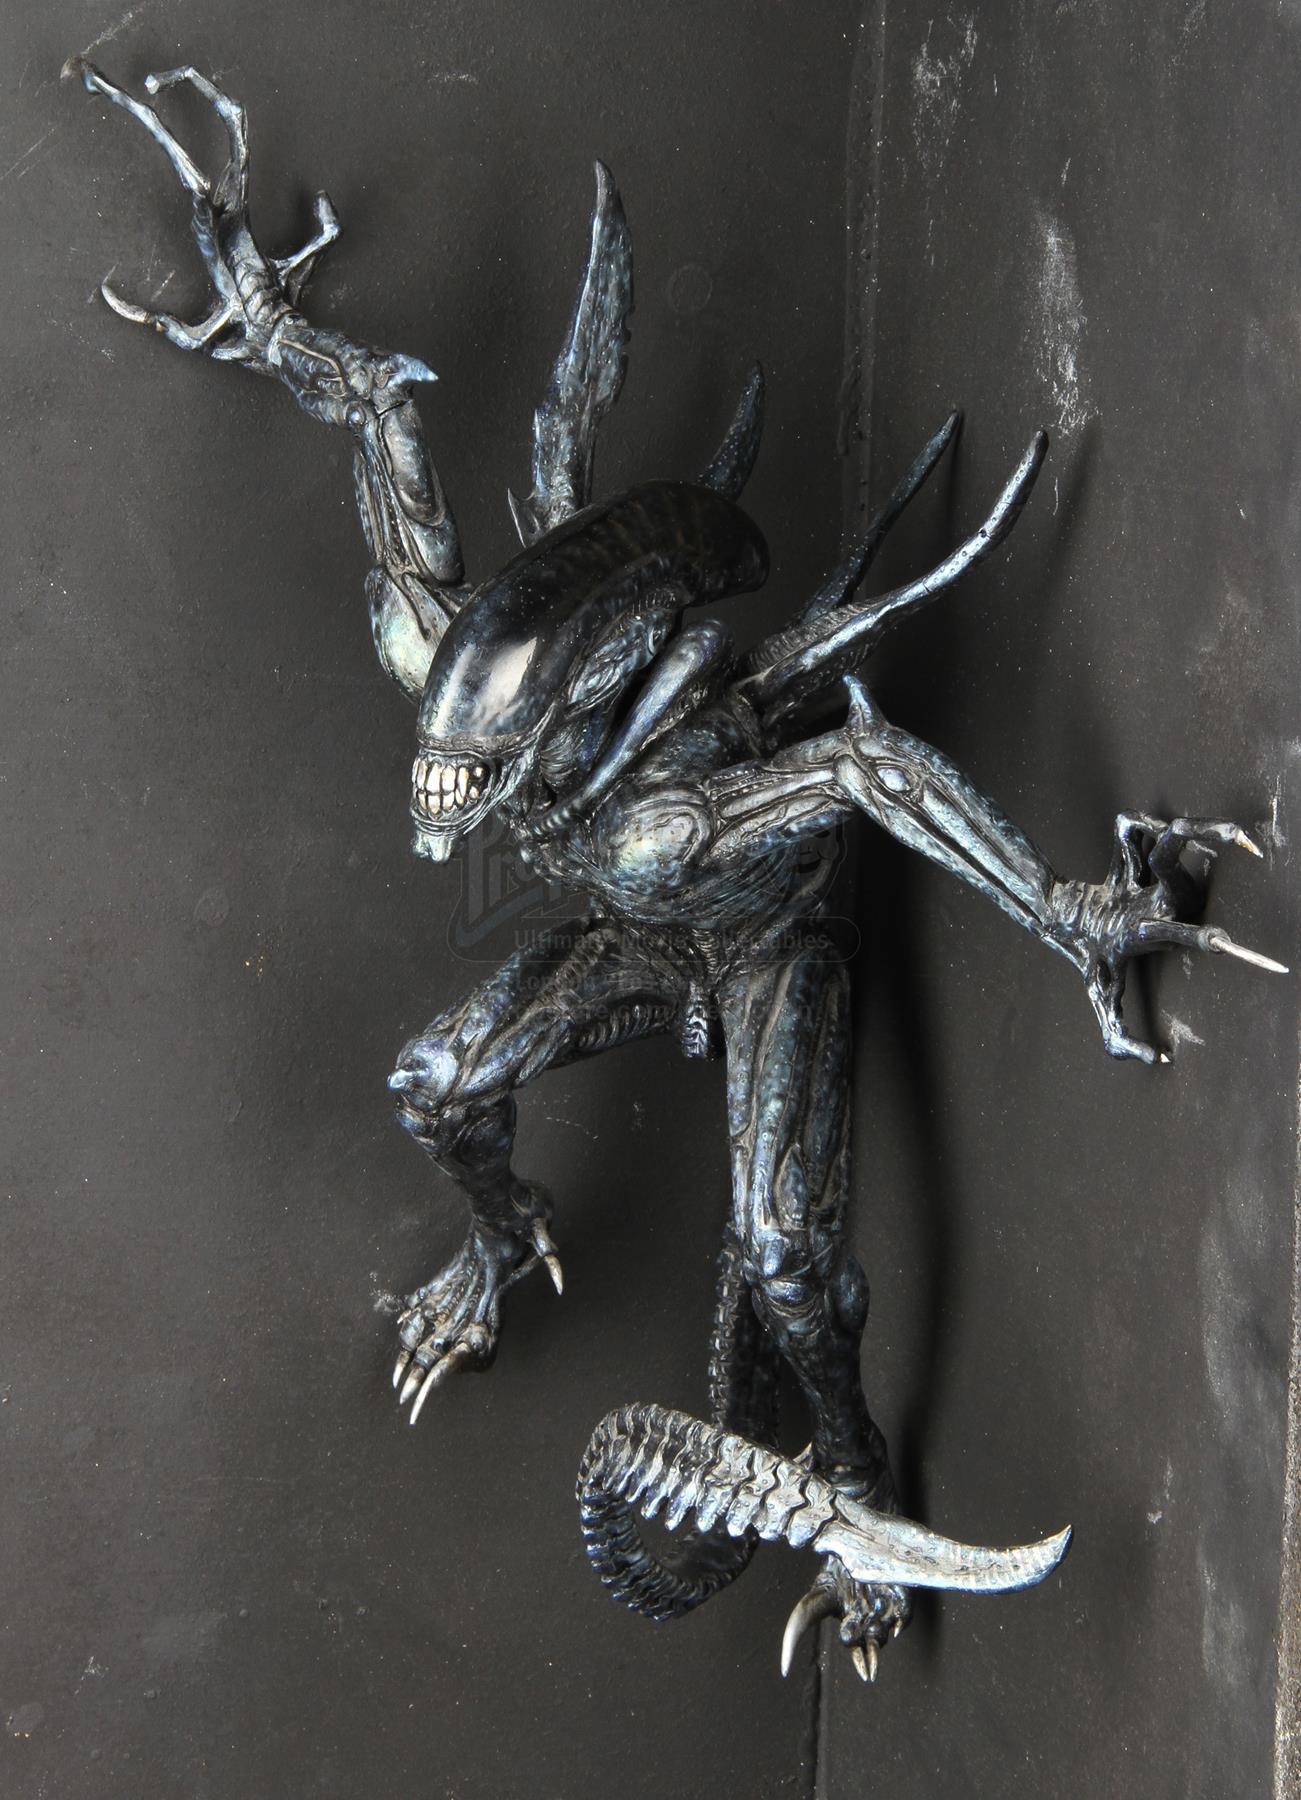 The master AVP:R Wolf predator maquette from ADI Studios